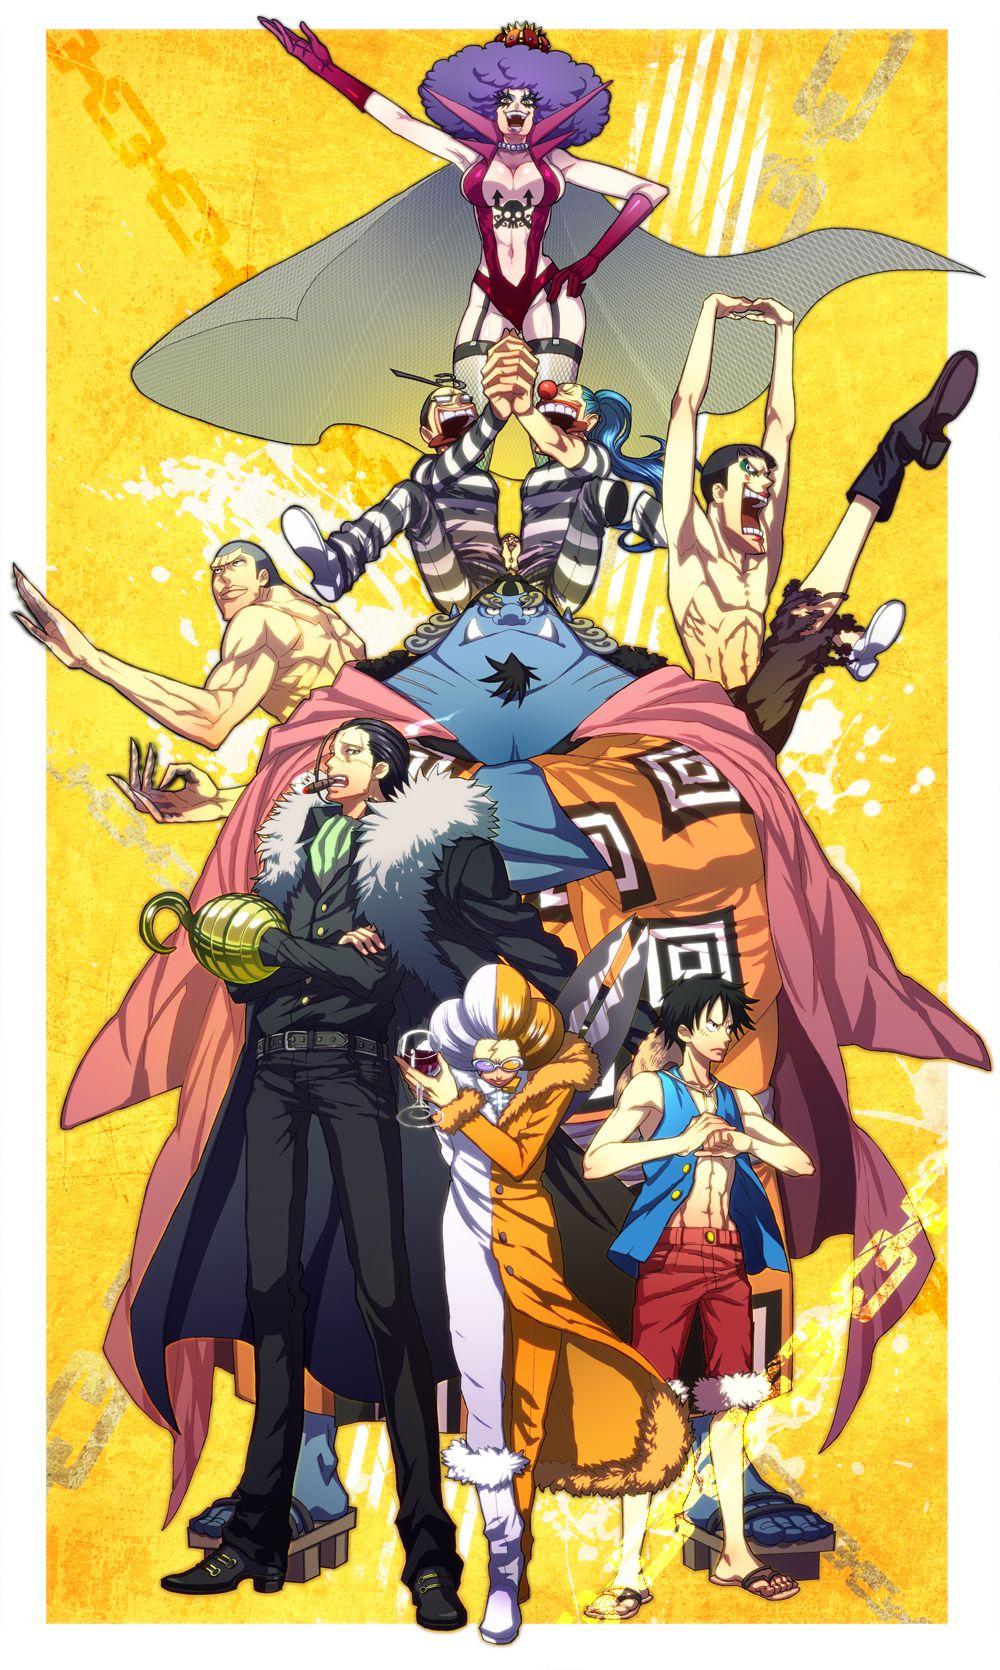 Arco Impel Down | One piece manga, One piece anime, One ...